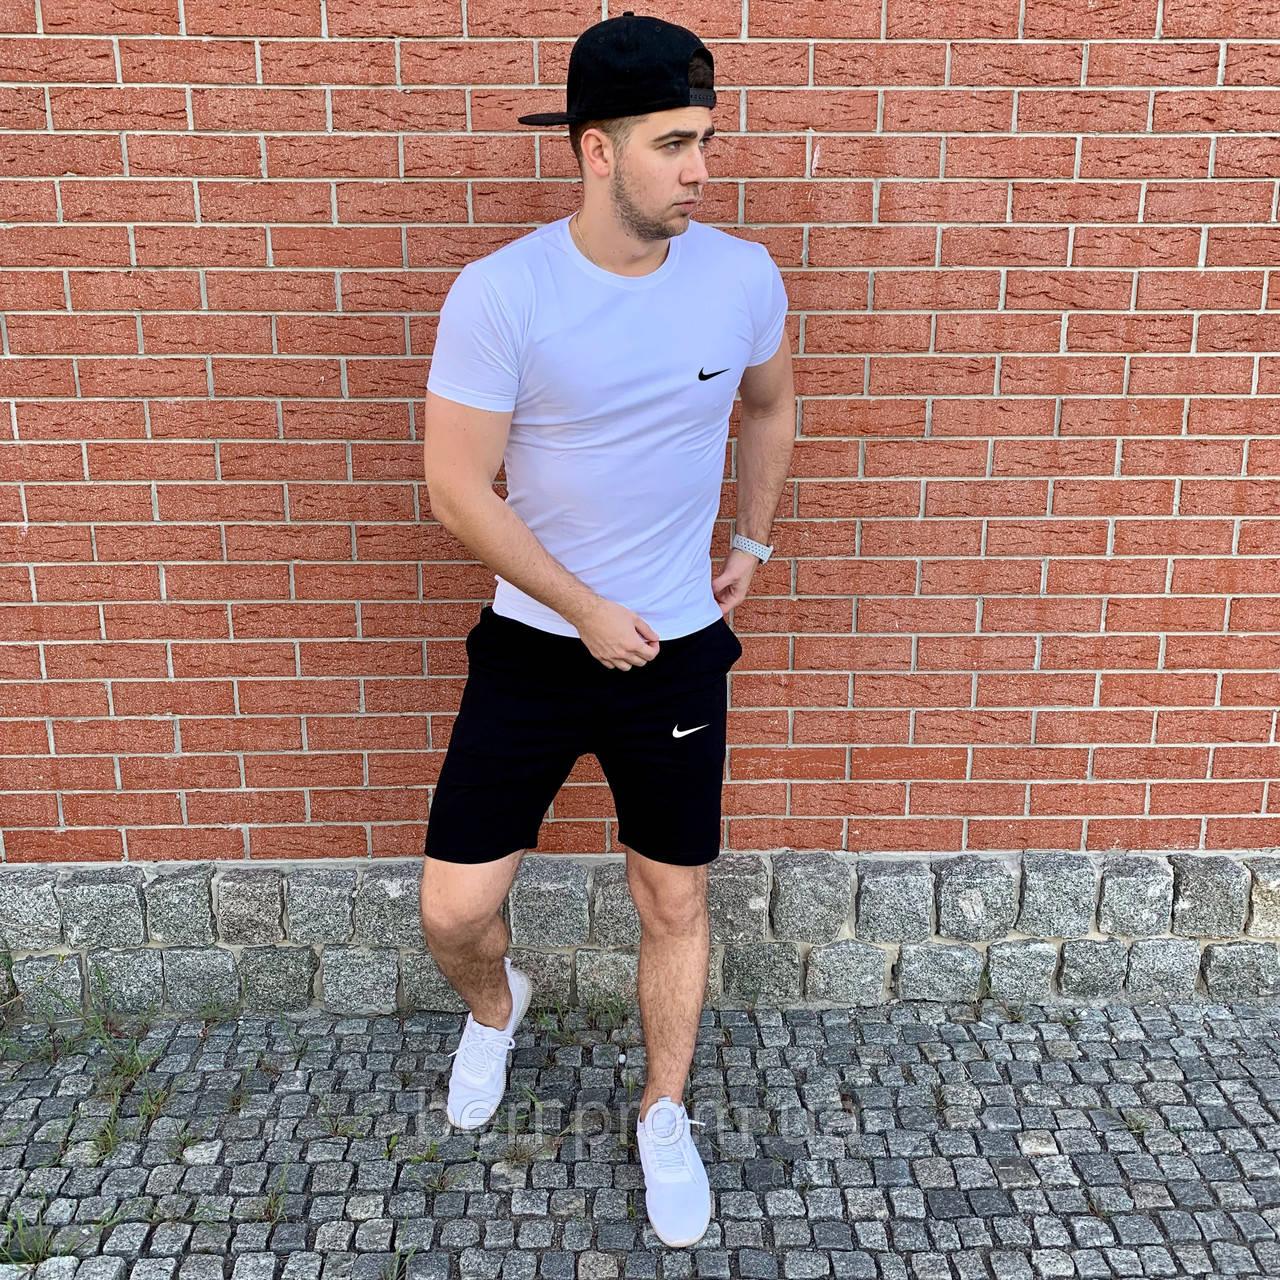 7b5b194b Мужской летний спортивный костюм, комплект шорты и футболка Nike | Найк  (Черно-Белый